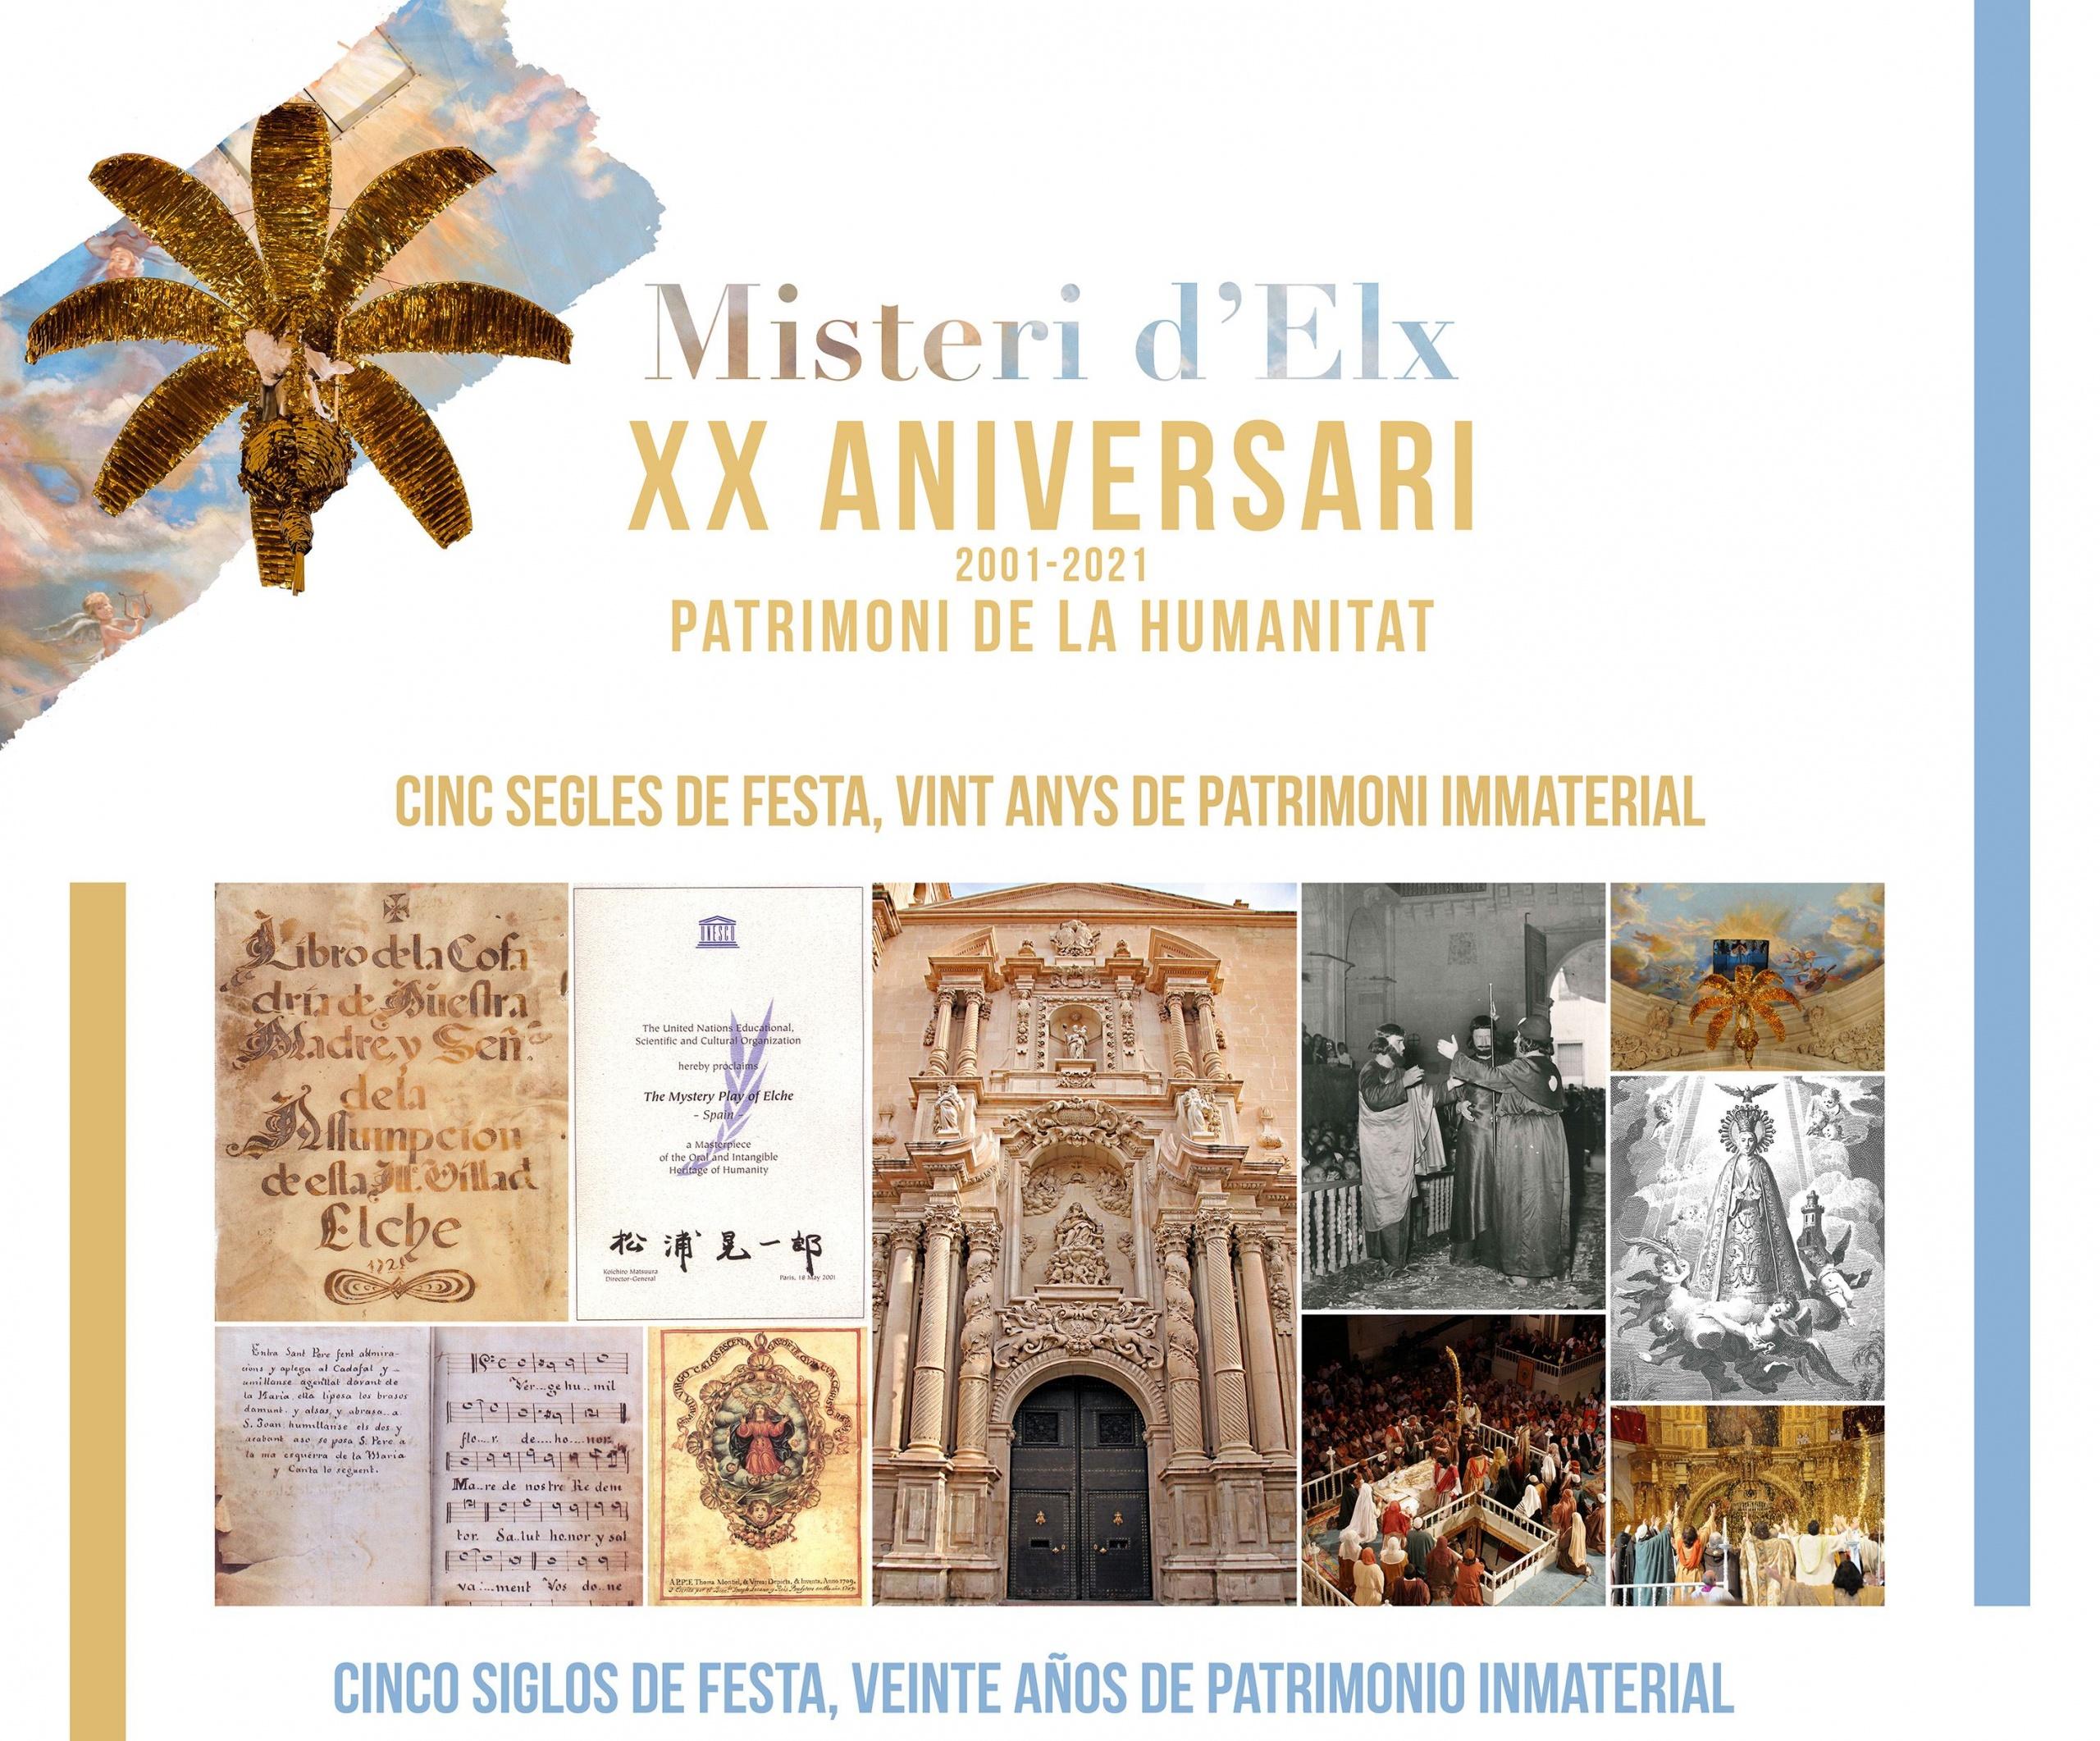 XX aniversario del Misteri como patrimonio Unesco